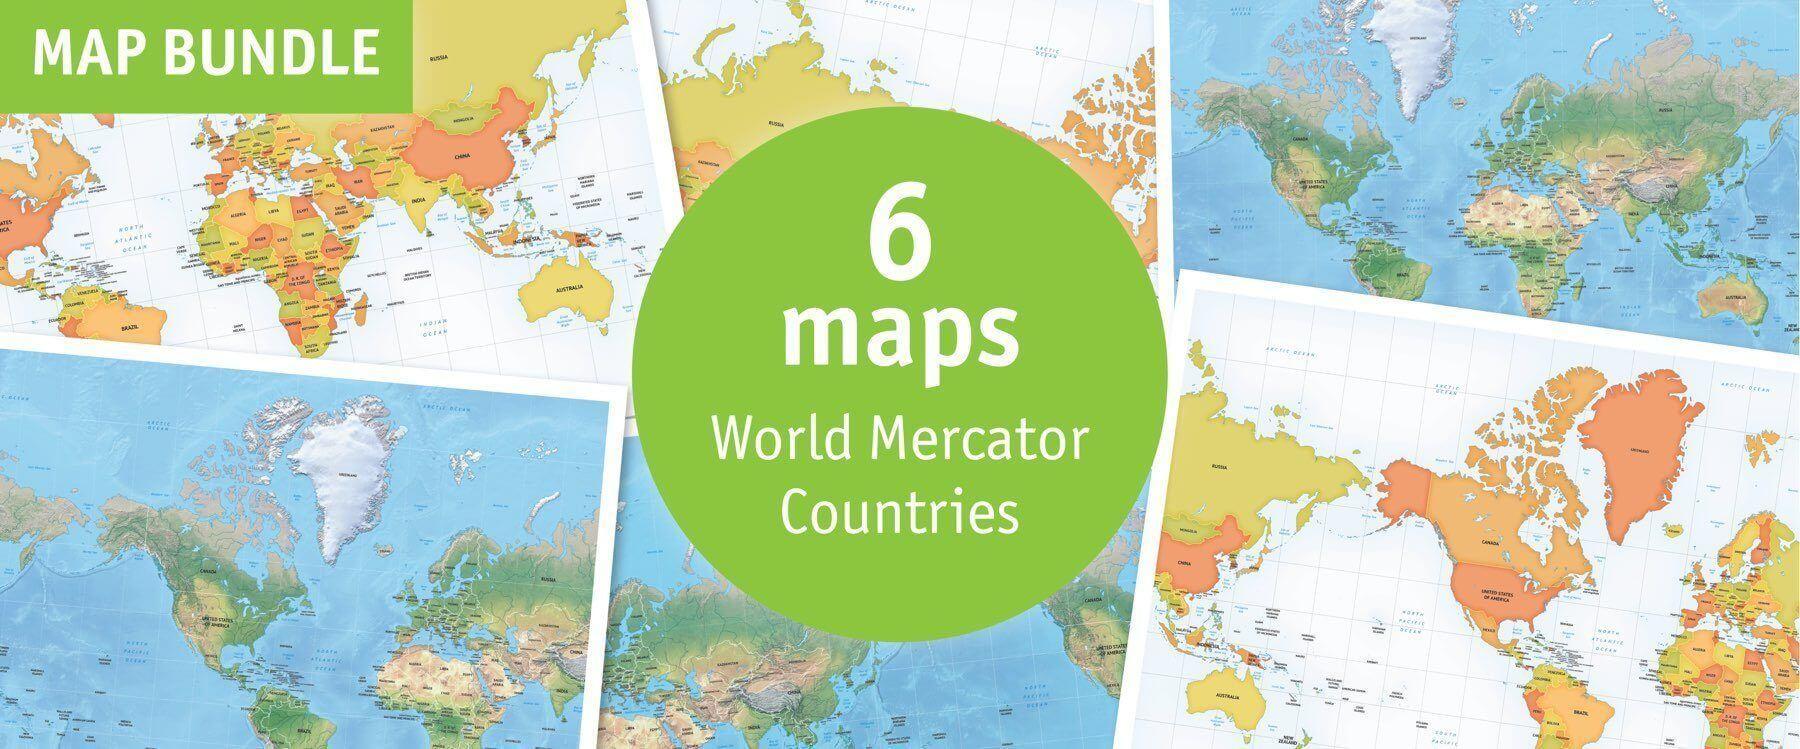 Map bundle World Mercator countries